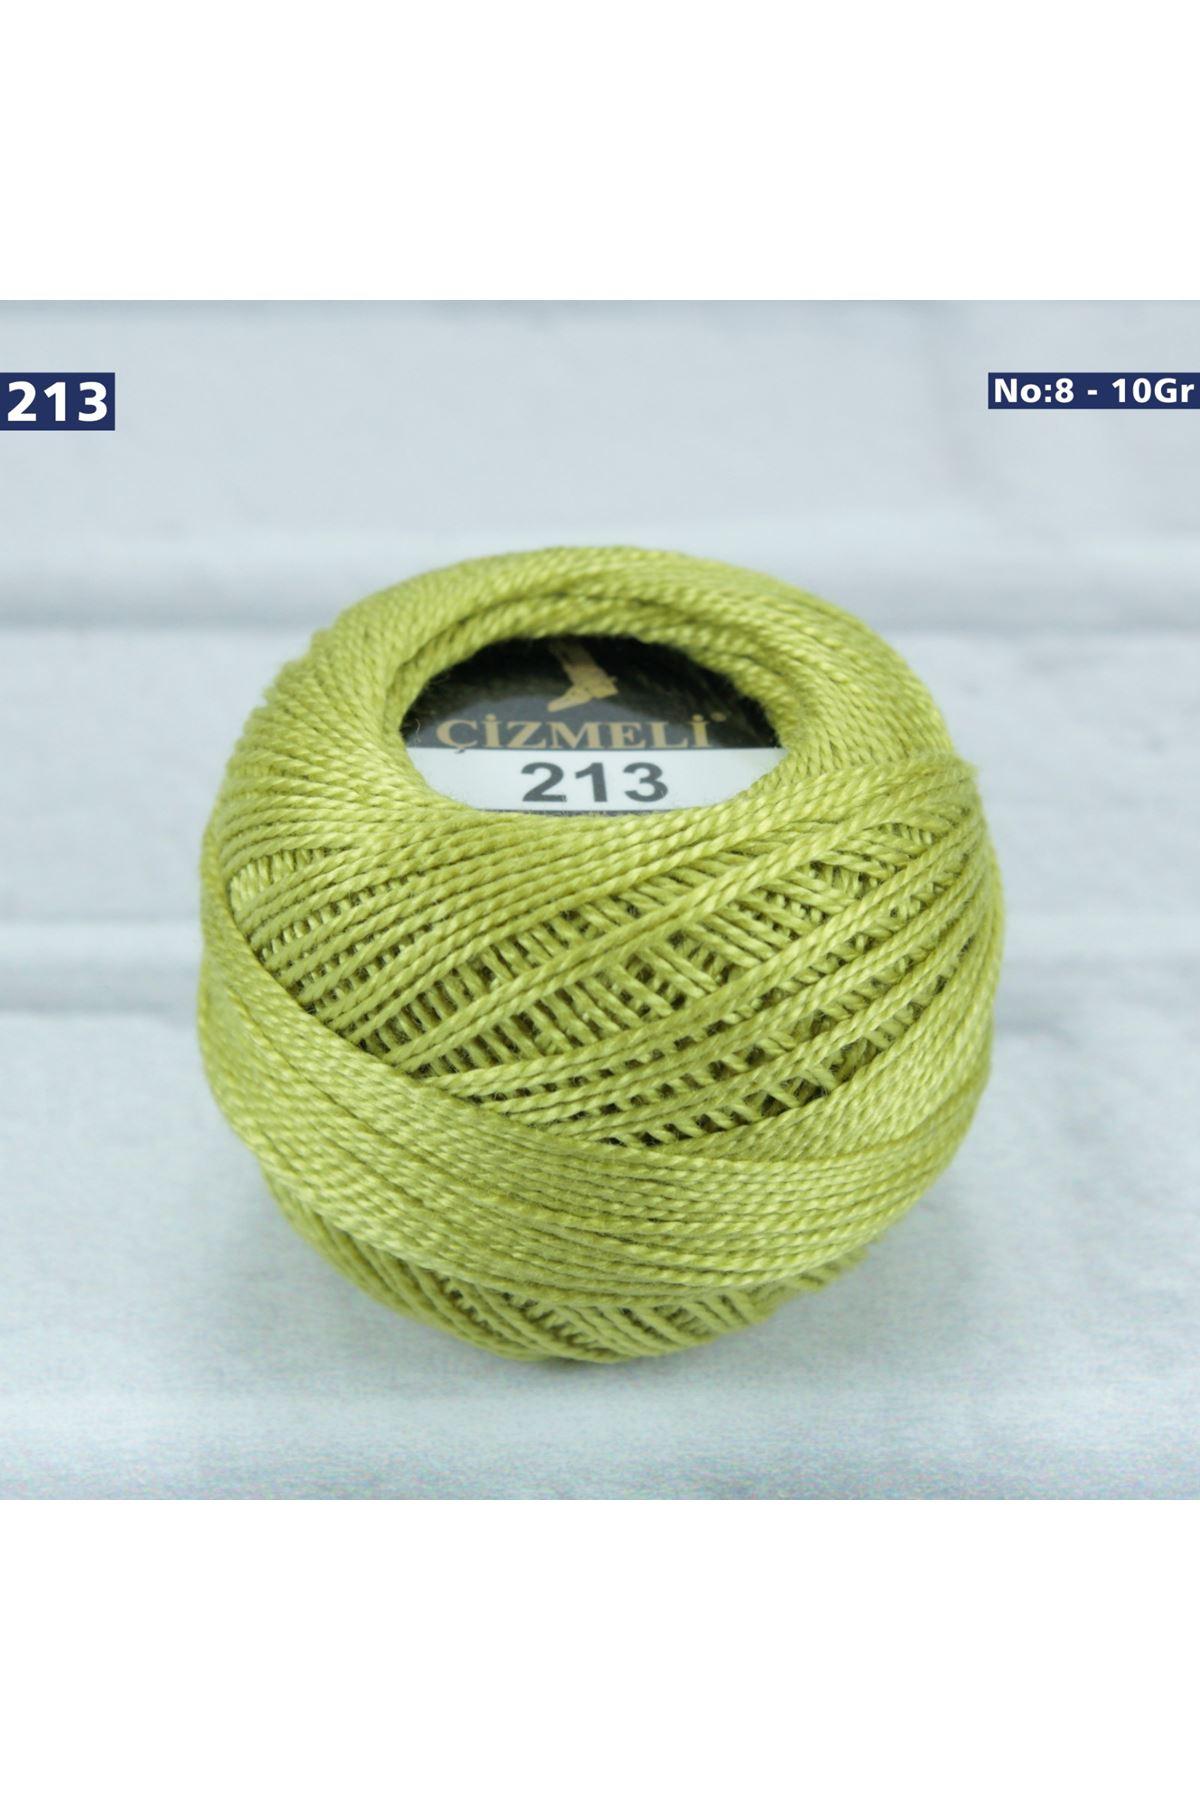 Çizmeli Cotton Perle Nakış İpliği No: 213